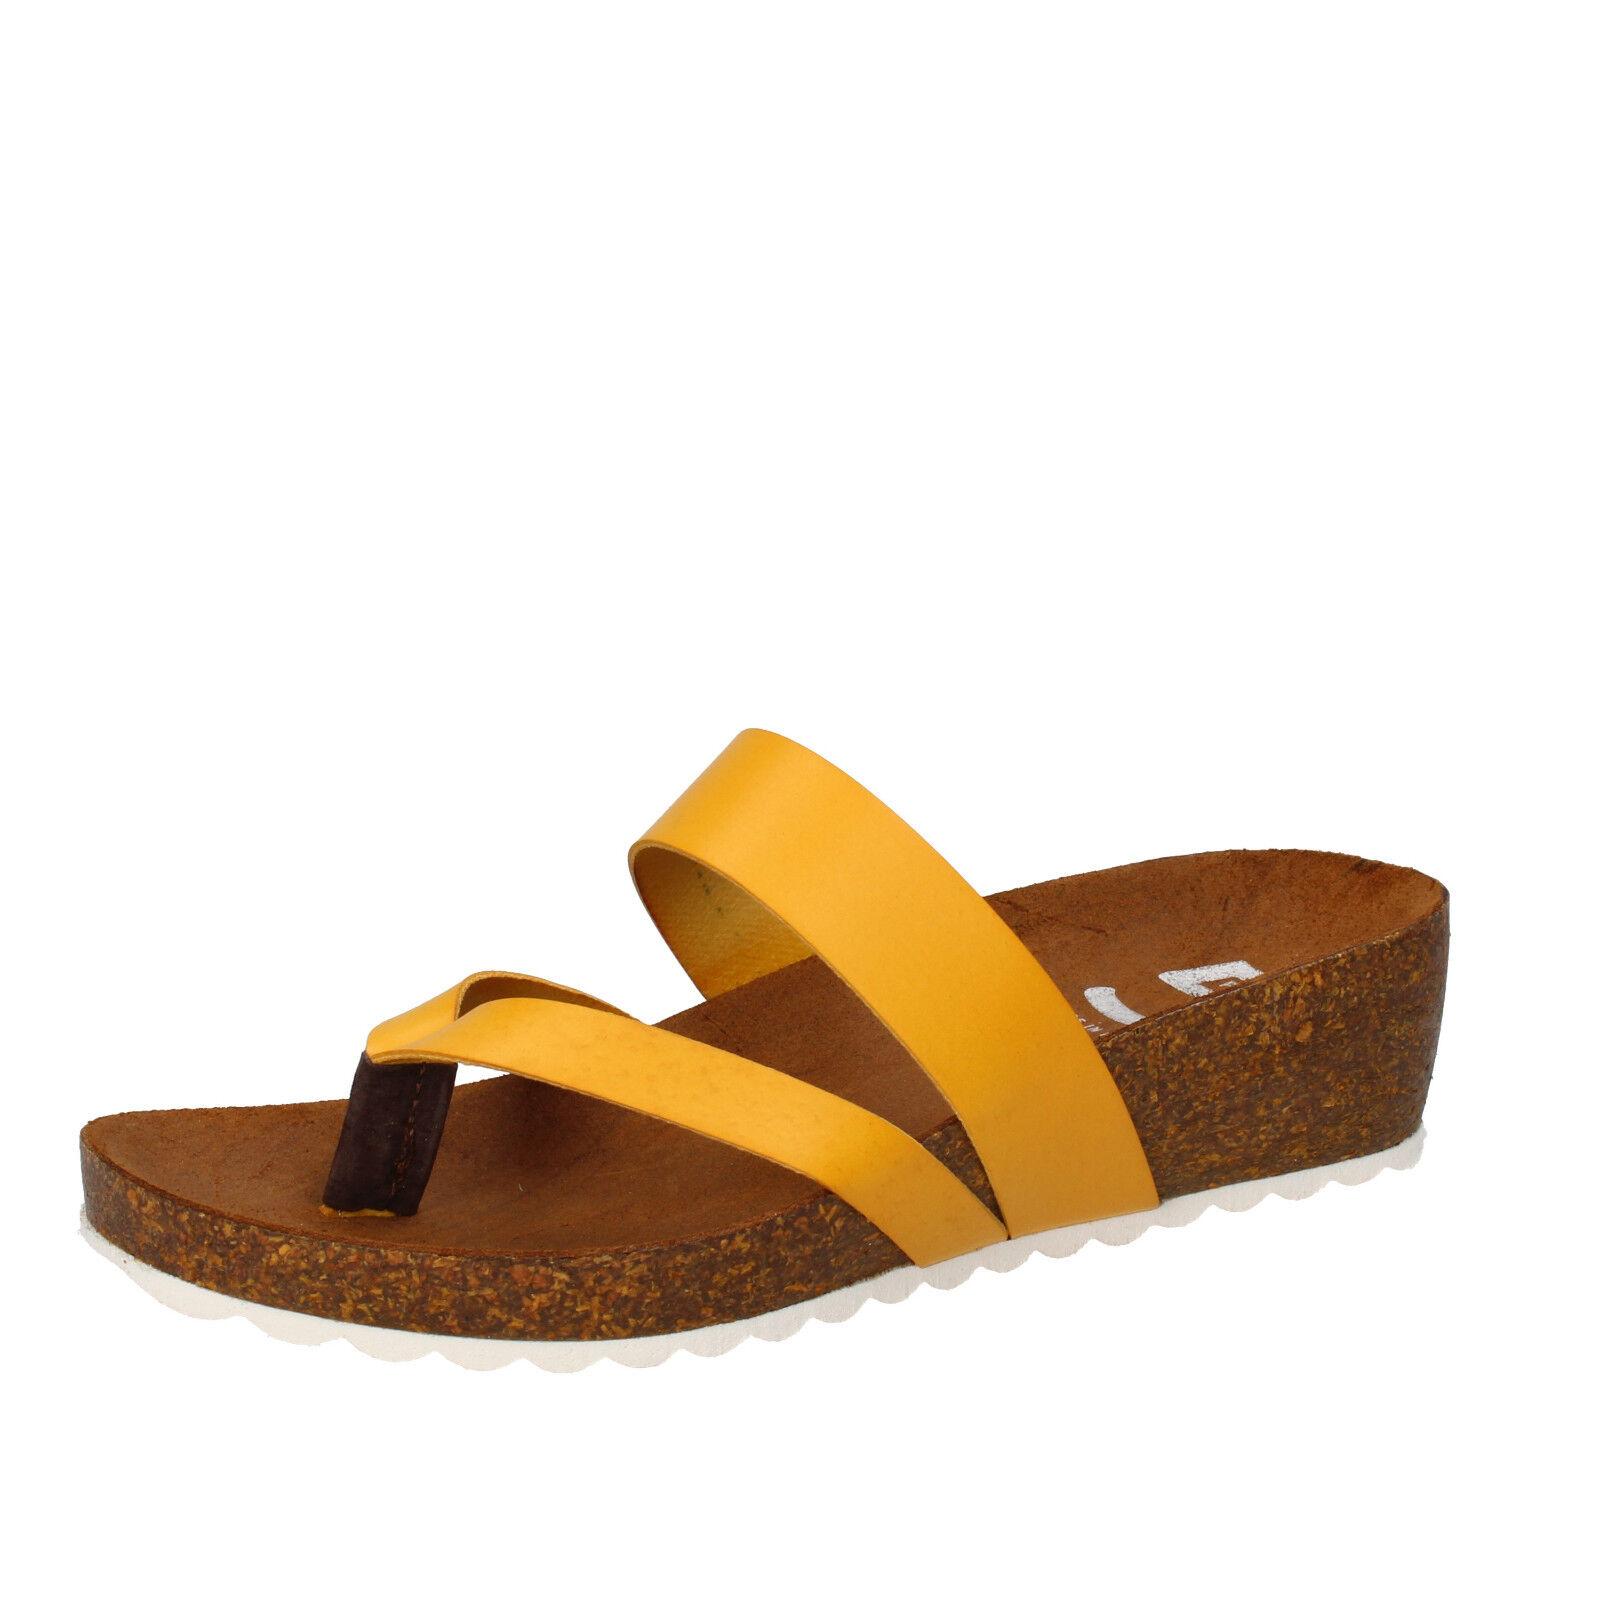 Scarpe donna 5 PRO JECT pelle 37 EU sandali giallo pelle JECT AC597-C a9c8e1